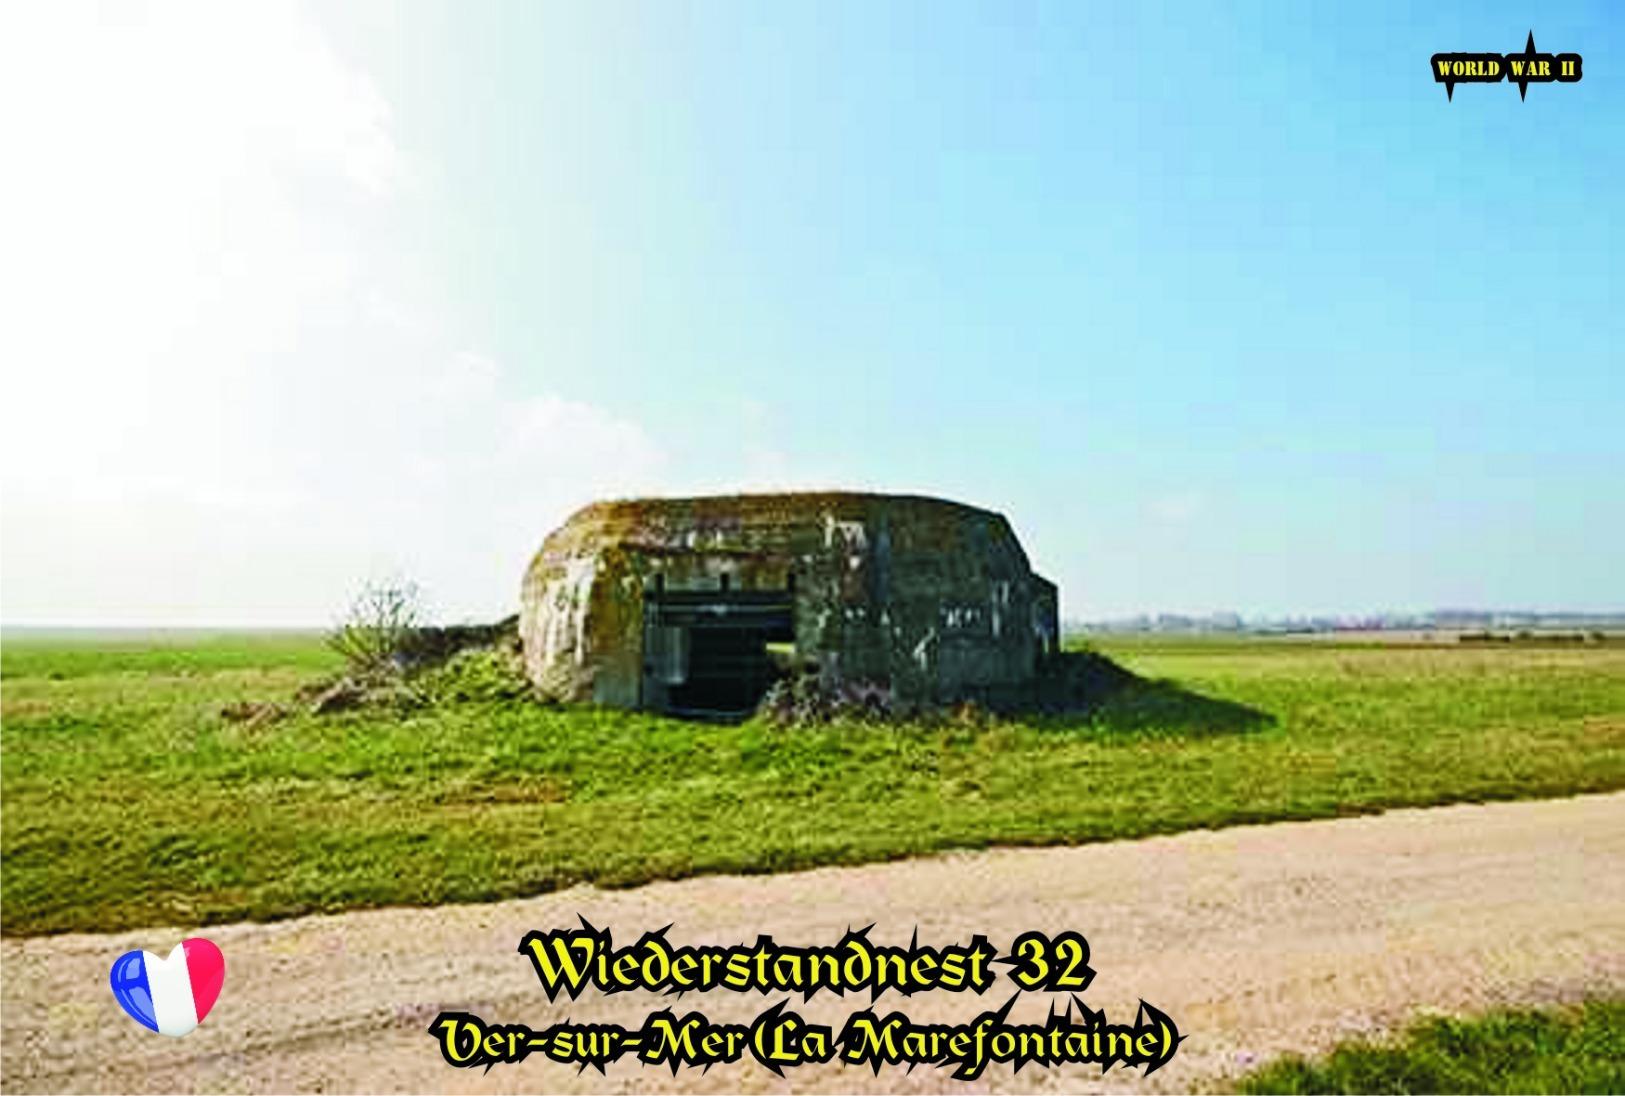 Set 4 Cartes Postales, WW II, Atlantique Mur, France, Ver-sur-Mer (La Marefontaine), Wiederstandnest  32 - Guerre 1939-45